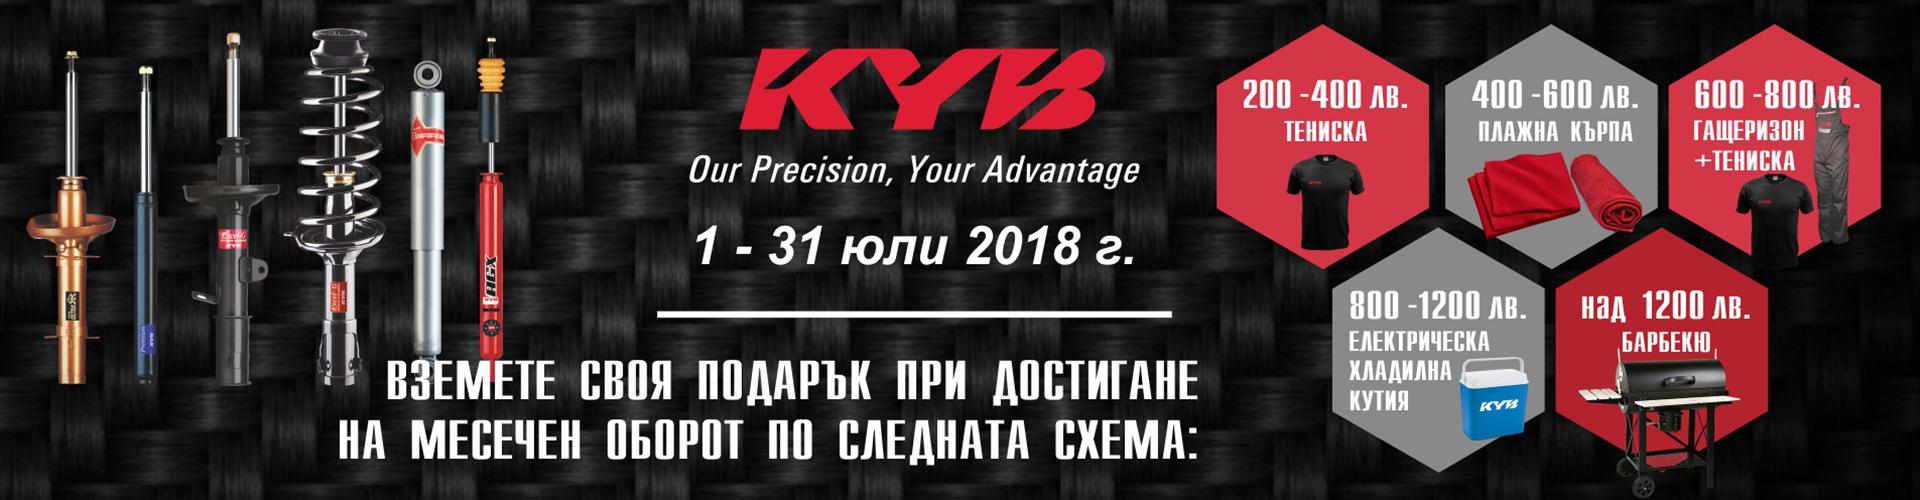 promo_kayaba_01072018-31072018_banner.jpg